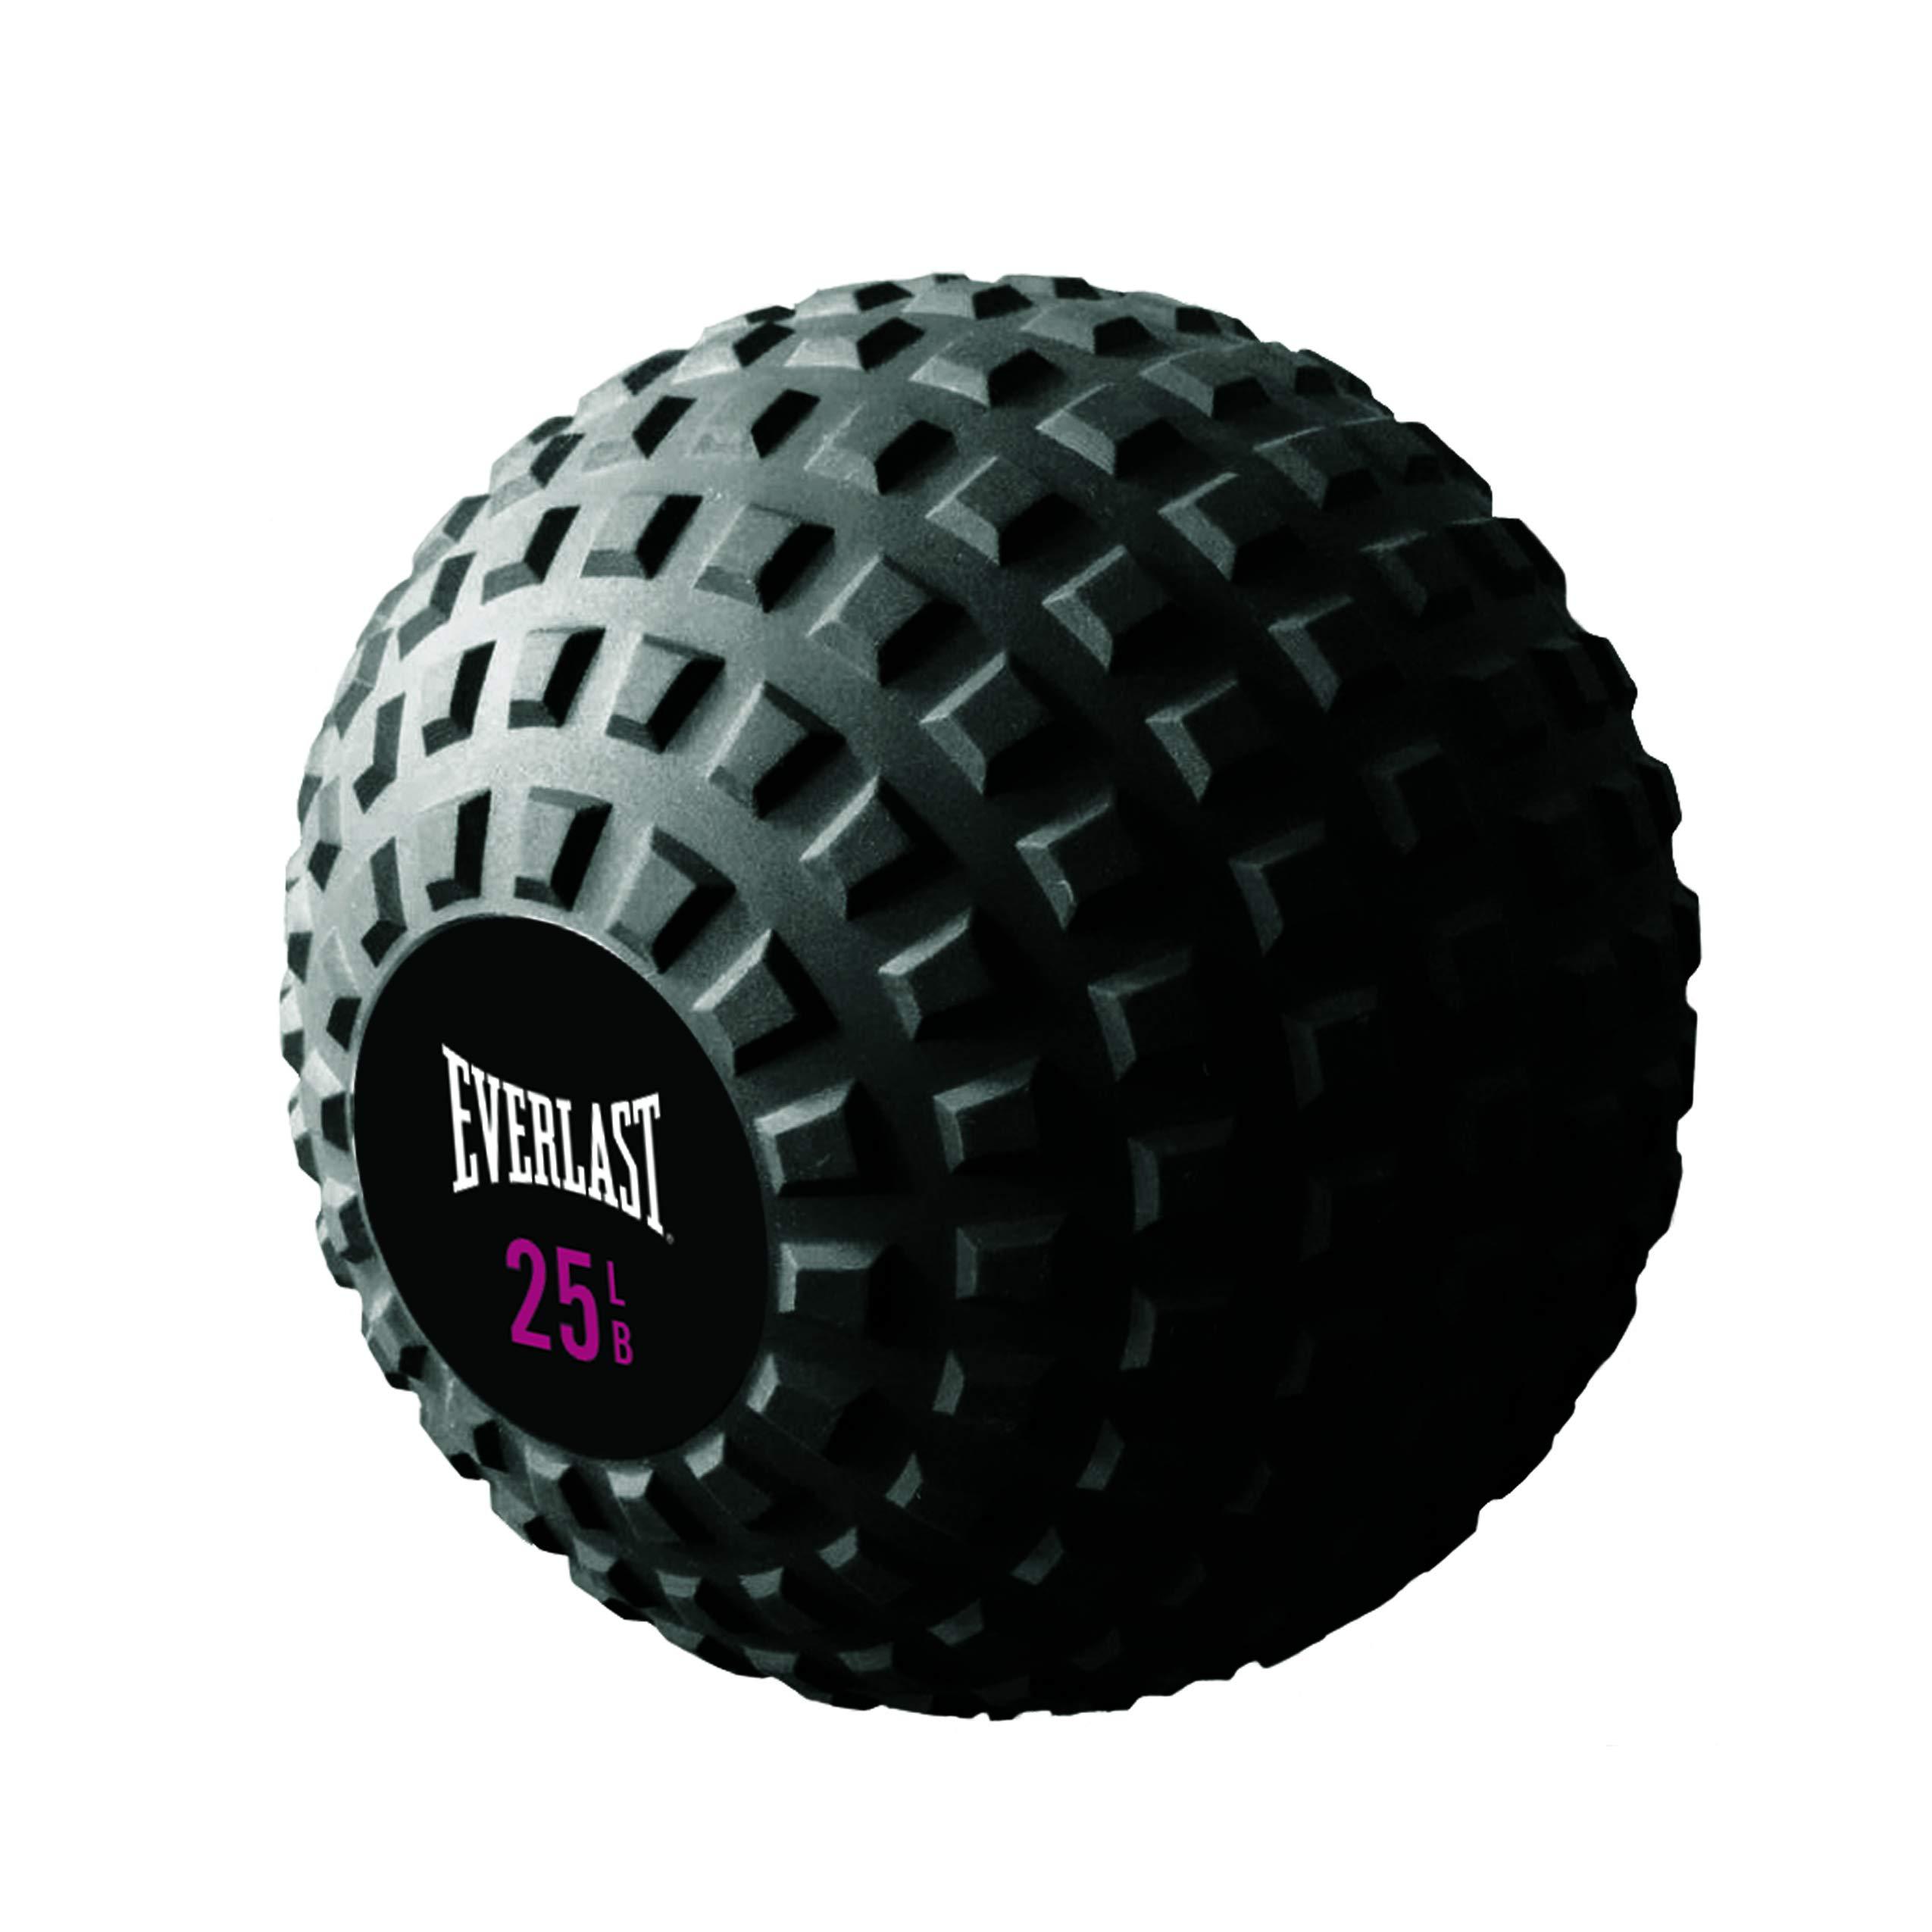 Everlast 25lb Textured Slam Ball Textured Slam Ball